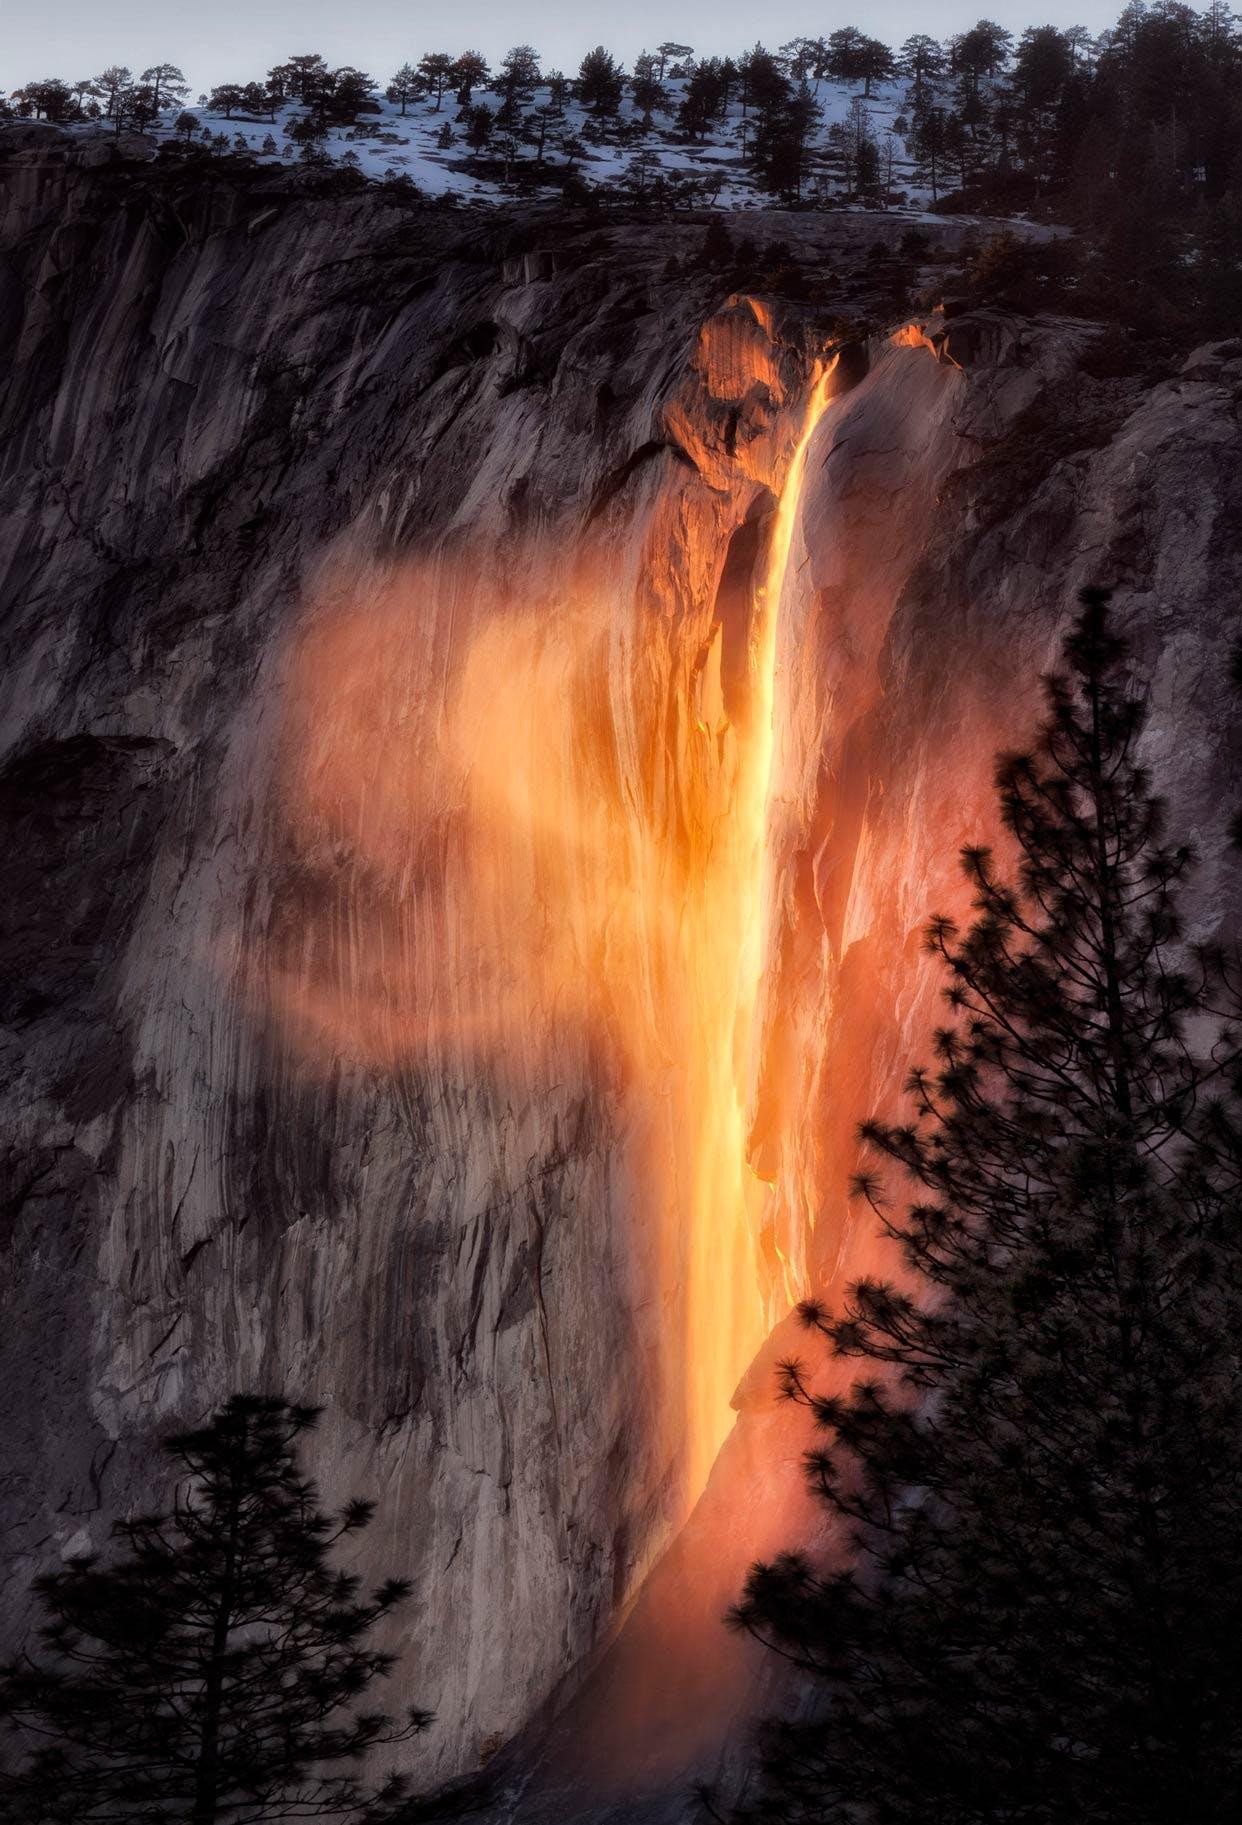 Merced Riverbank view of Horsetail Falls (Firefalls)